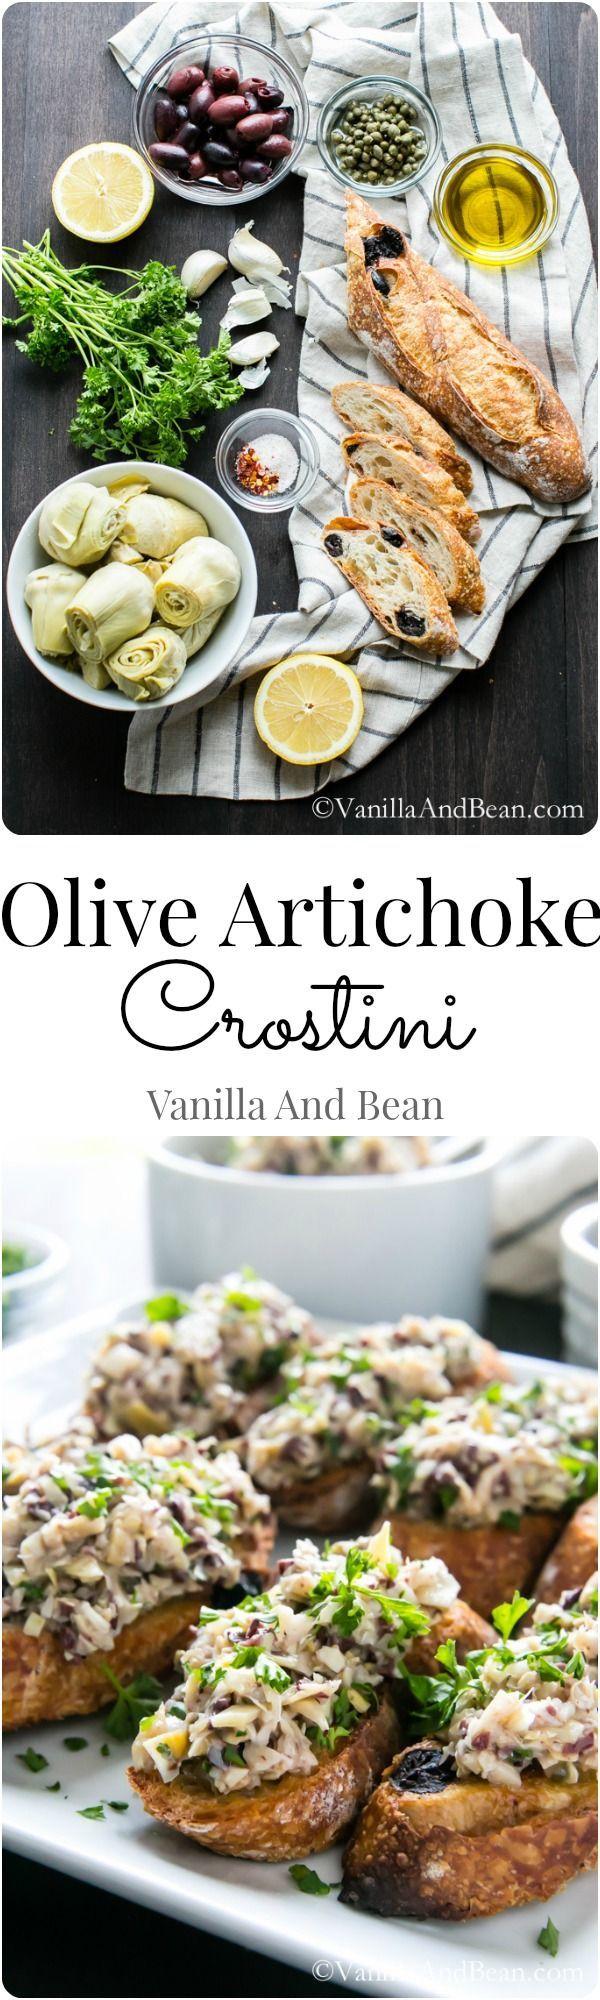 Quick and Easy Olive Artichoke Crostini. A fabulous make